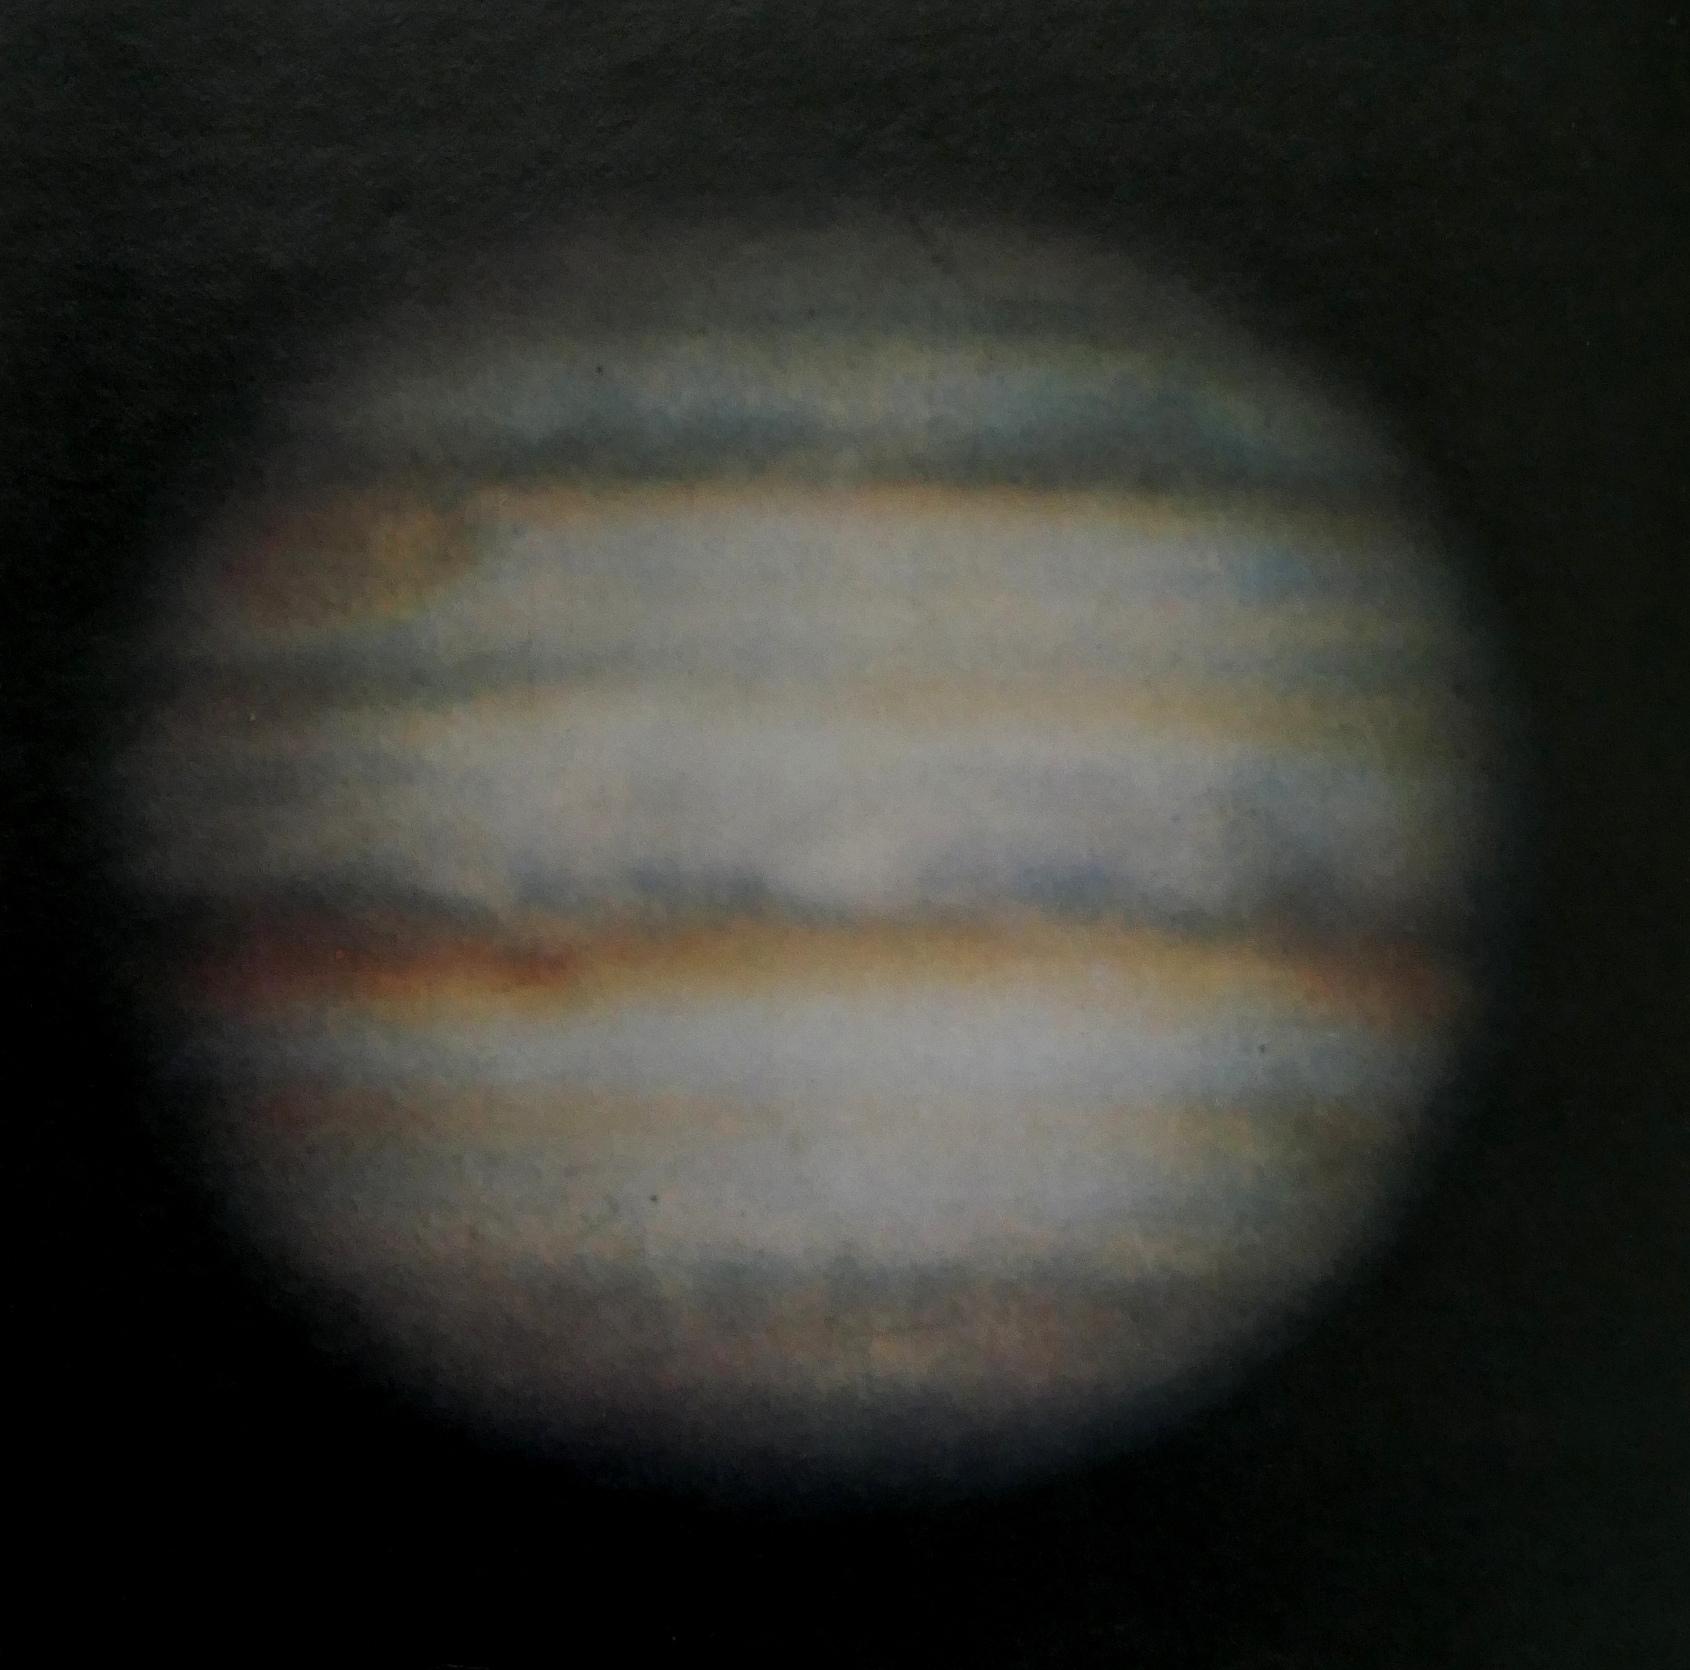 600eb35fa379d_La-lune-et-les-plantes_Pierre-de-Latil_Hachette_1969_Jupiter-Palomar_ASF.JPG.4fed7b2180ba9d9935eb165f5714ef30.JPG